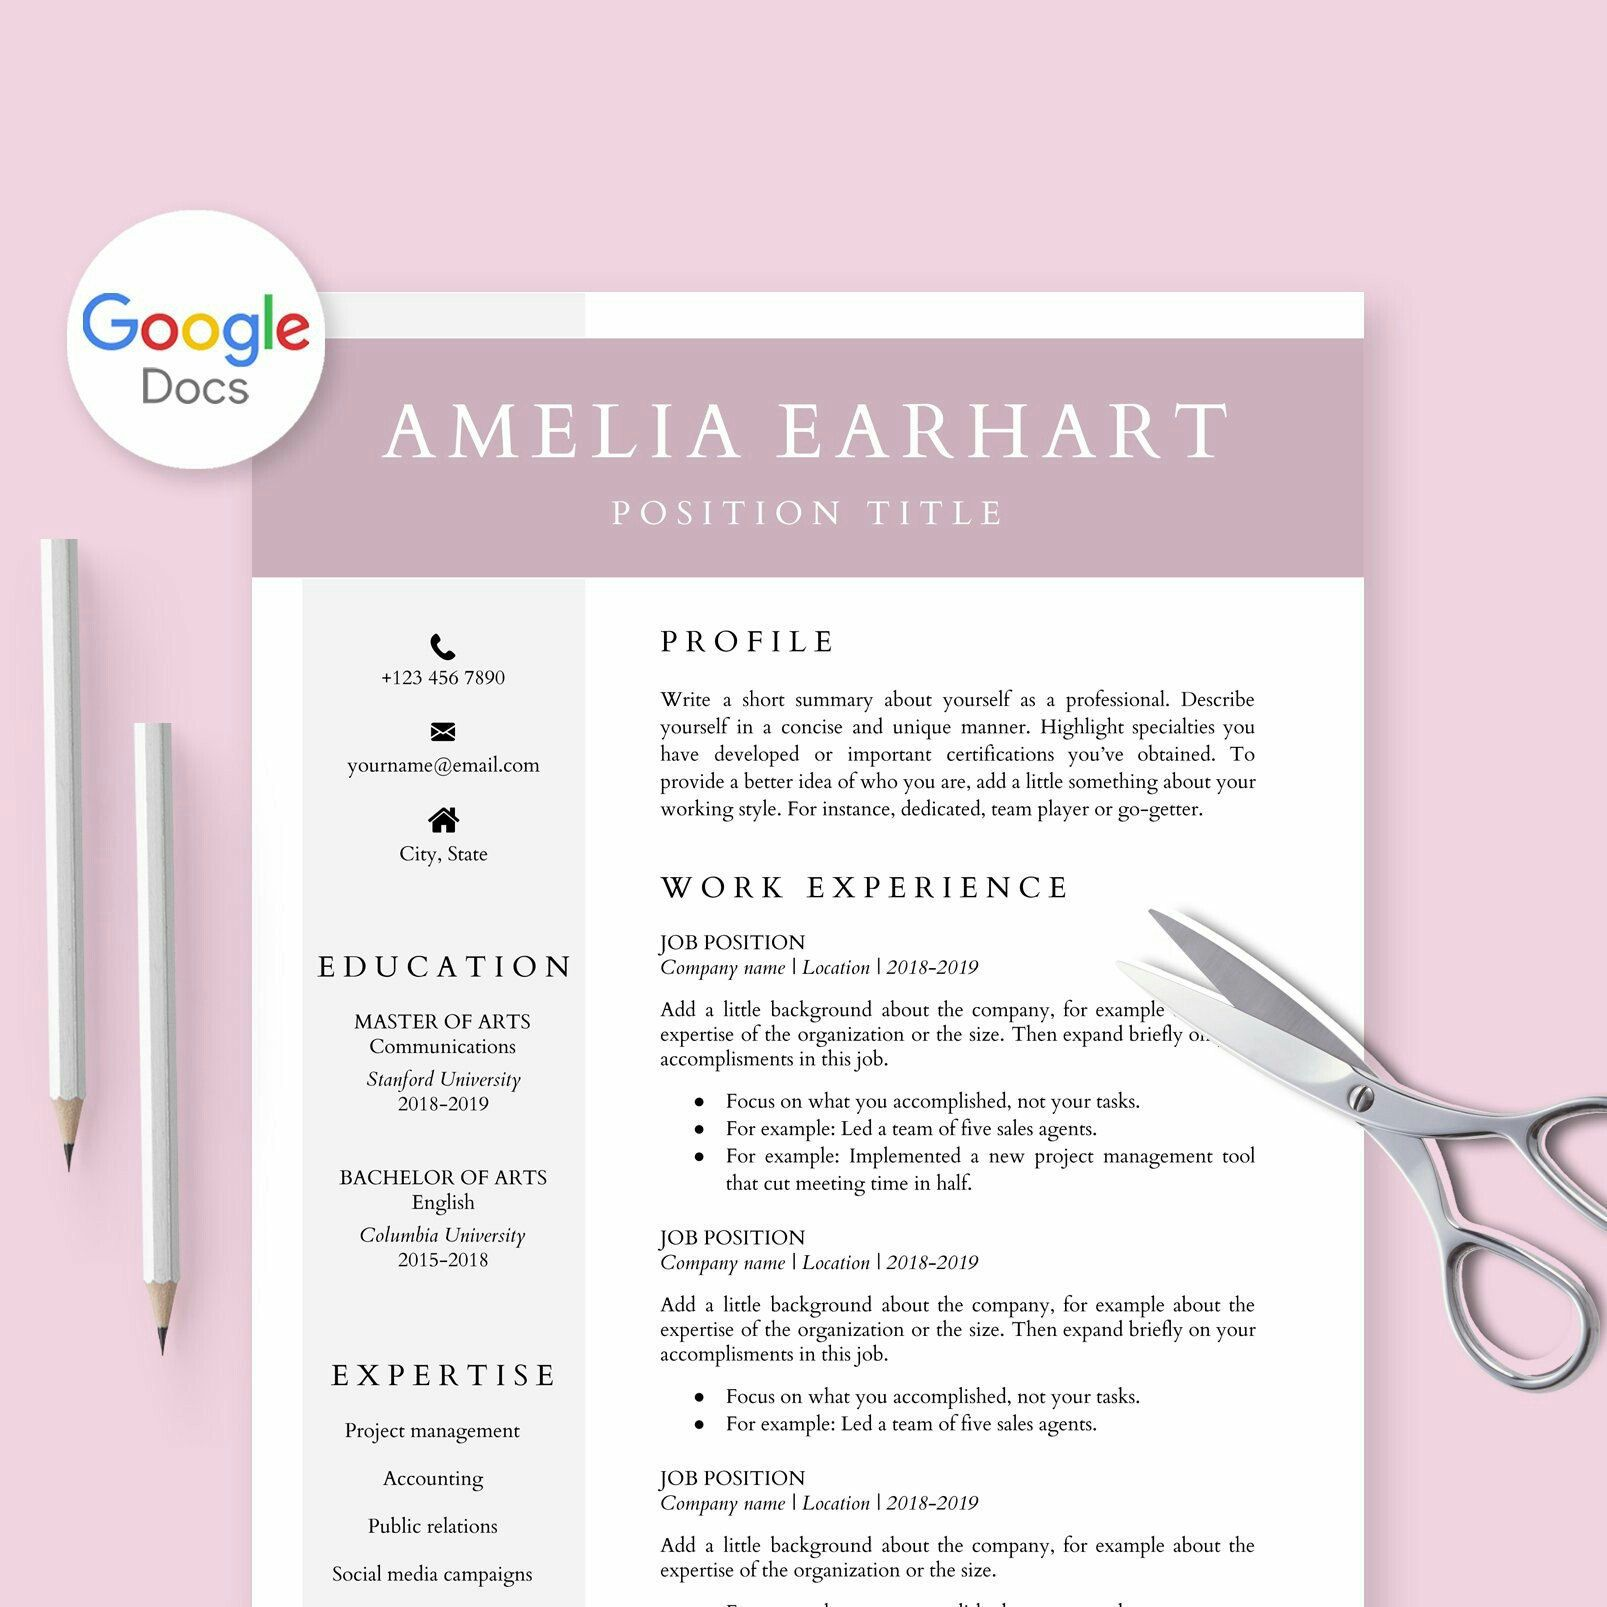 Resume Template for Google Docs, Cv Template Google Doc